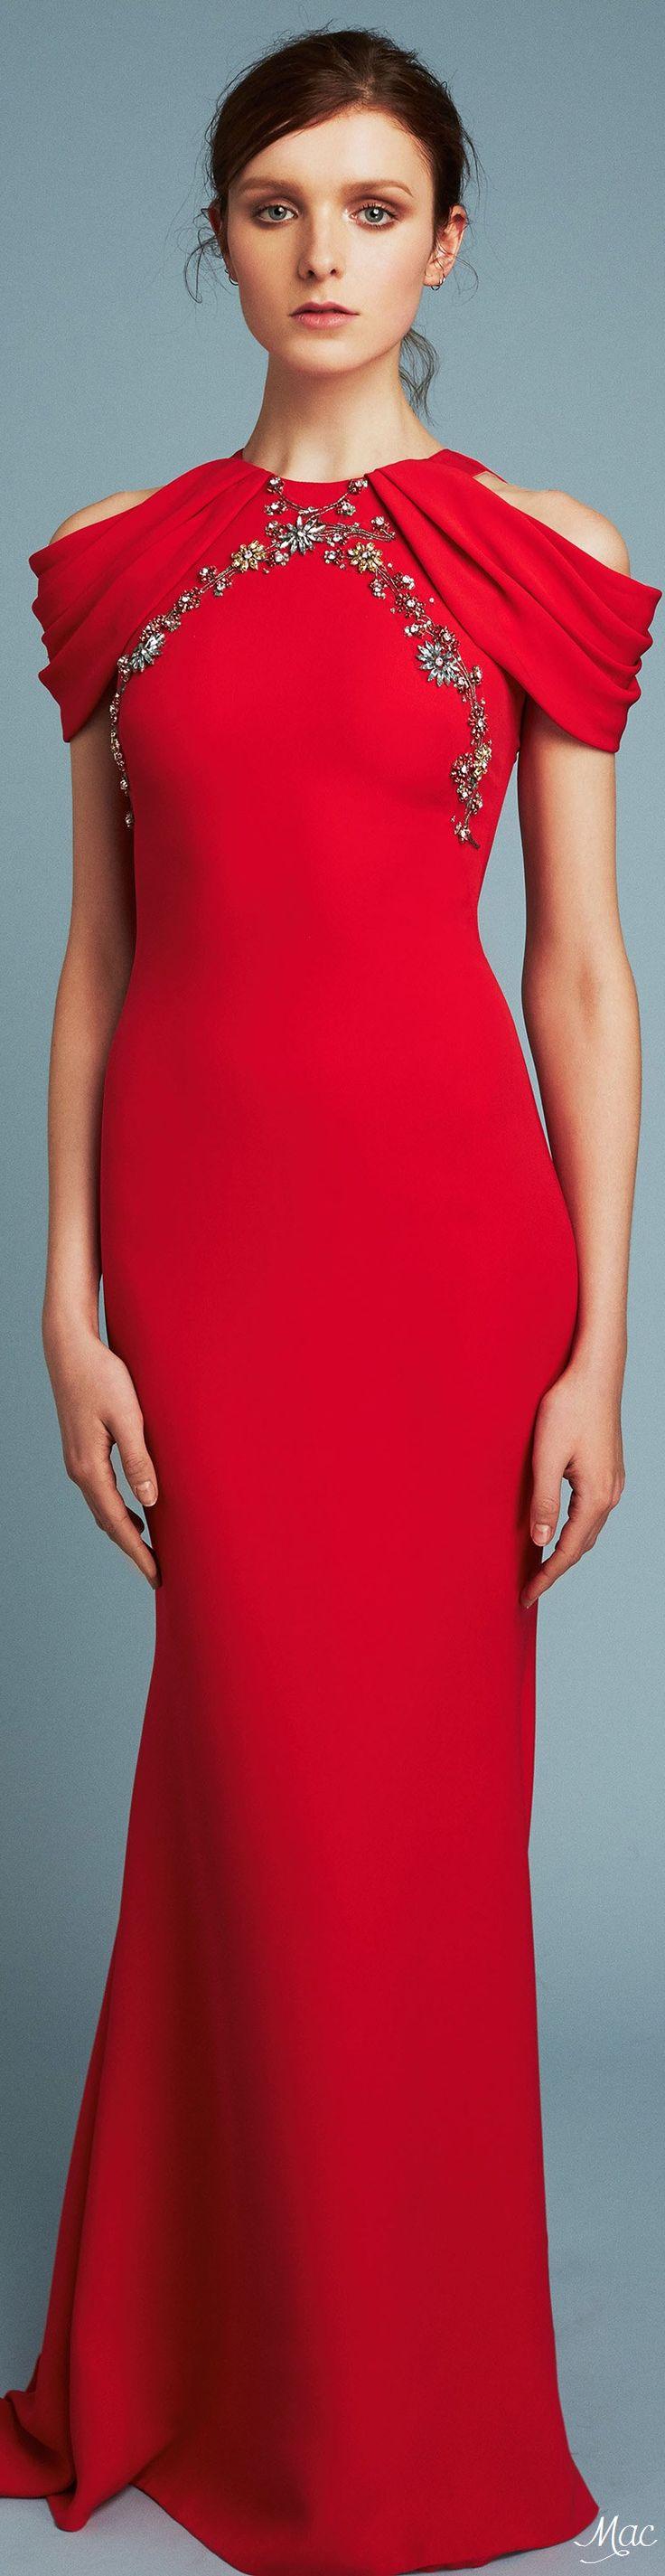 97 best Reem Acra images on Pinterest | High fashion, Fashion show ...